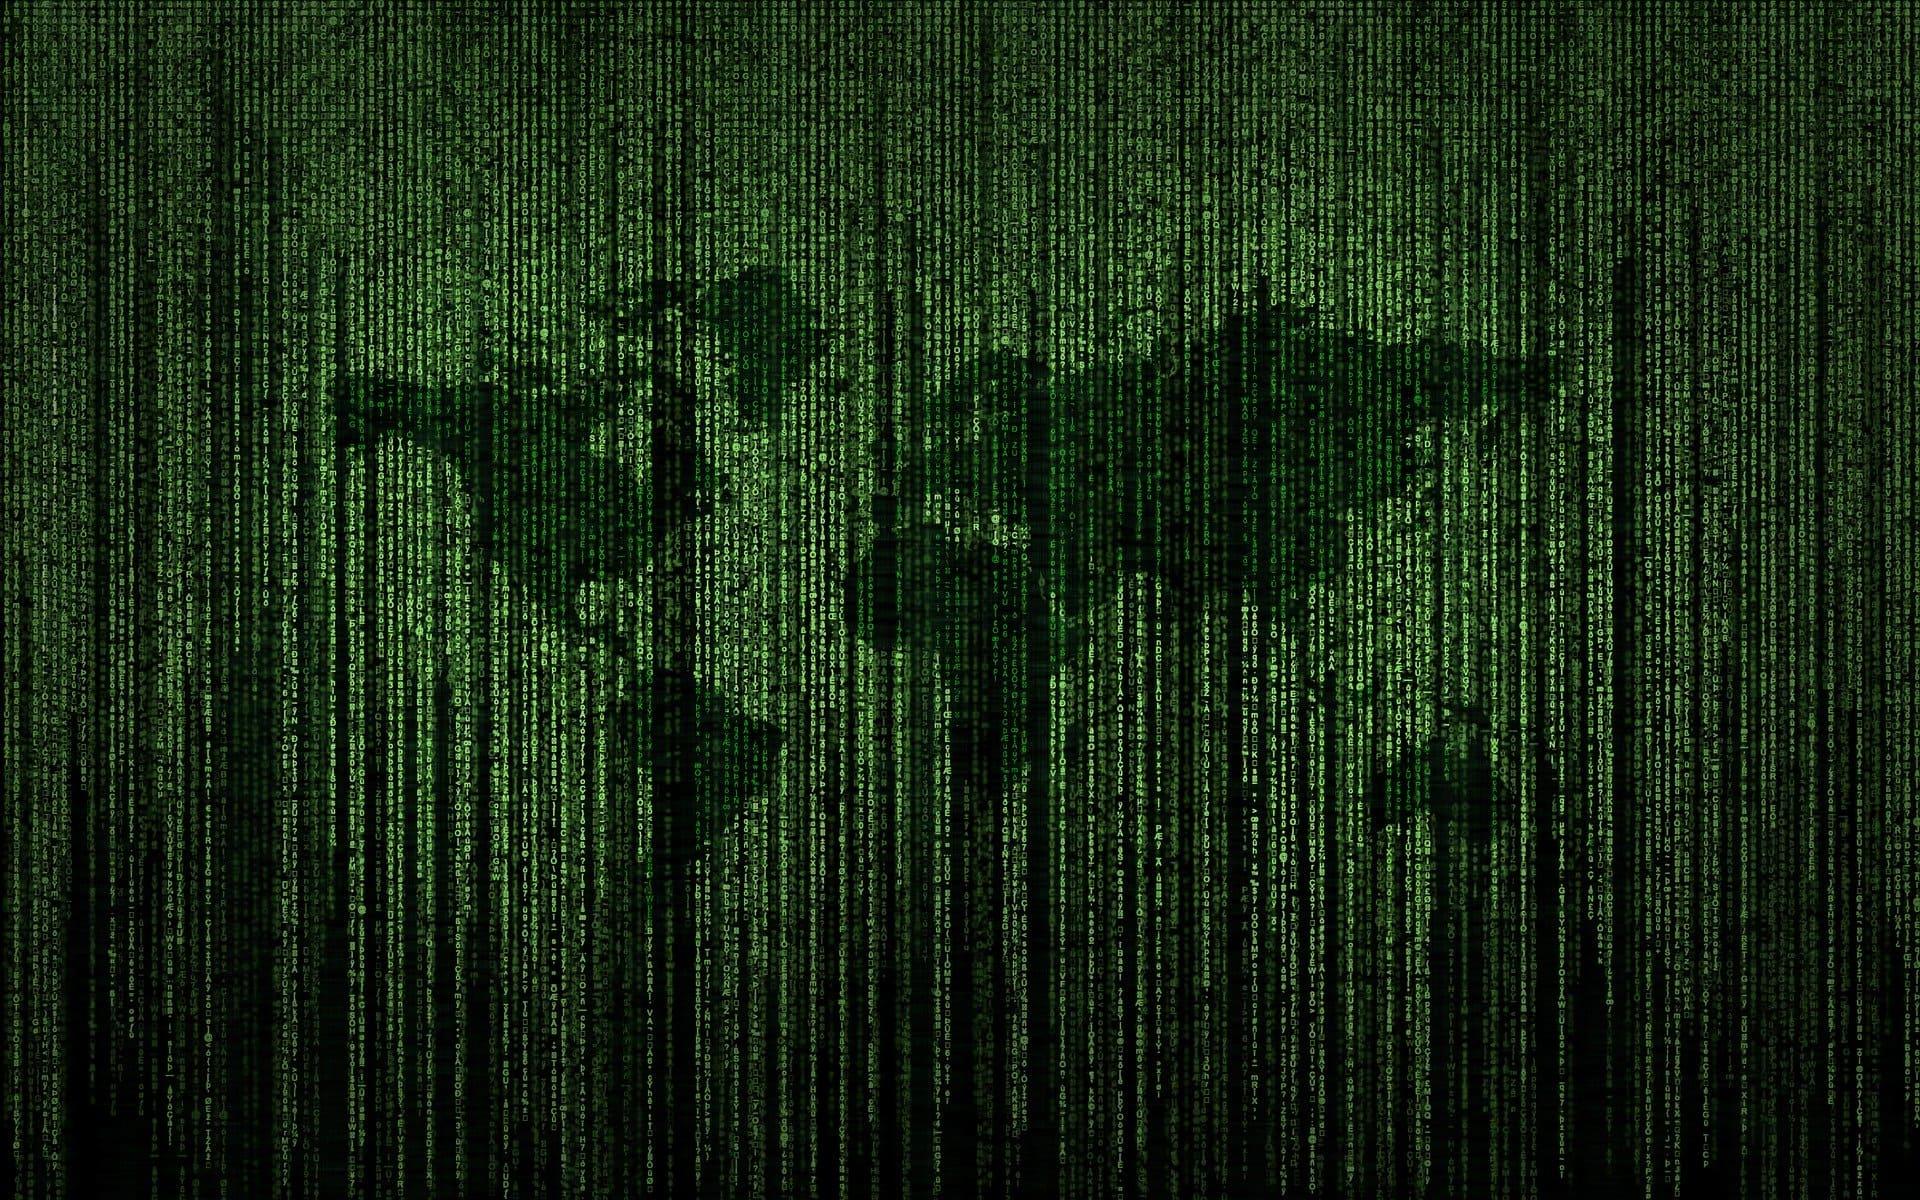 DDos 最大攻擊流量